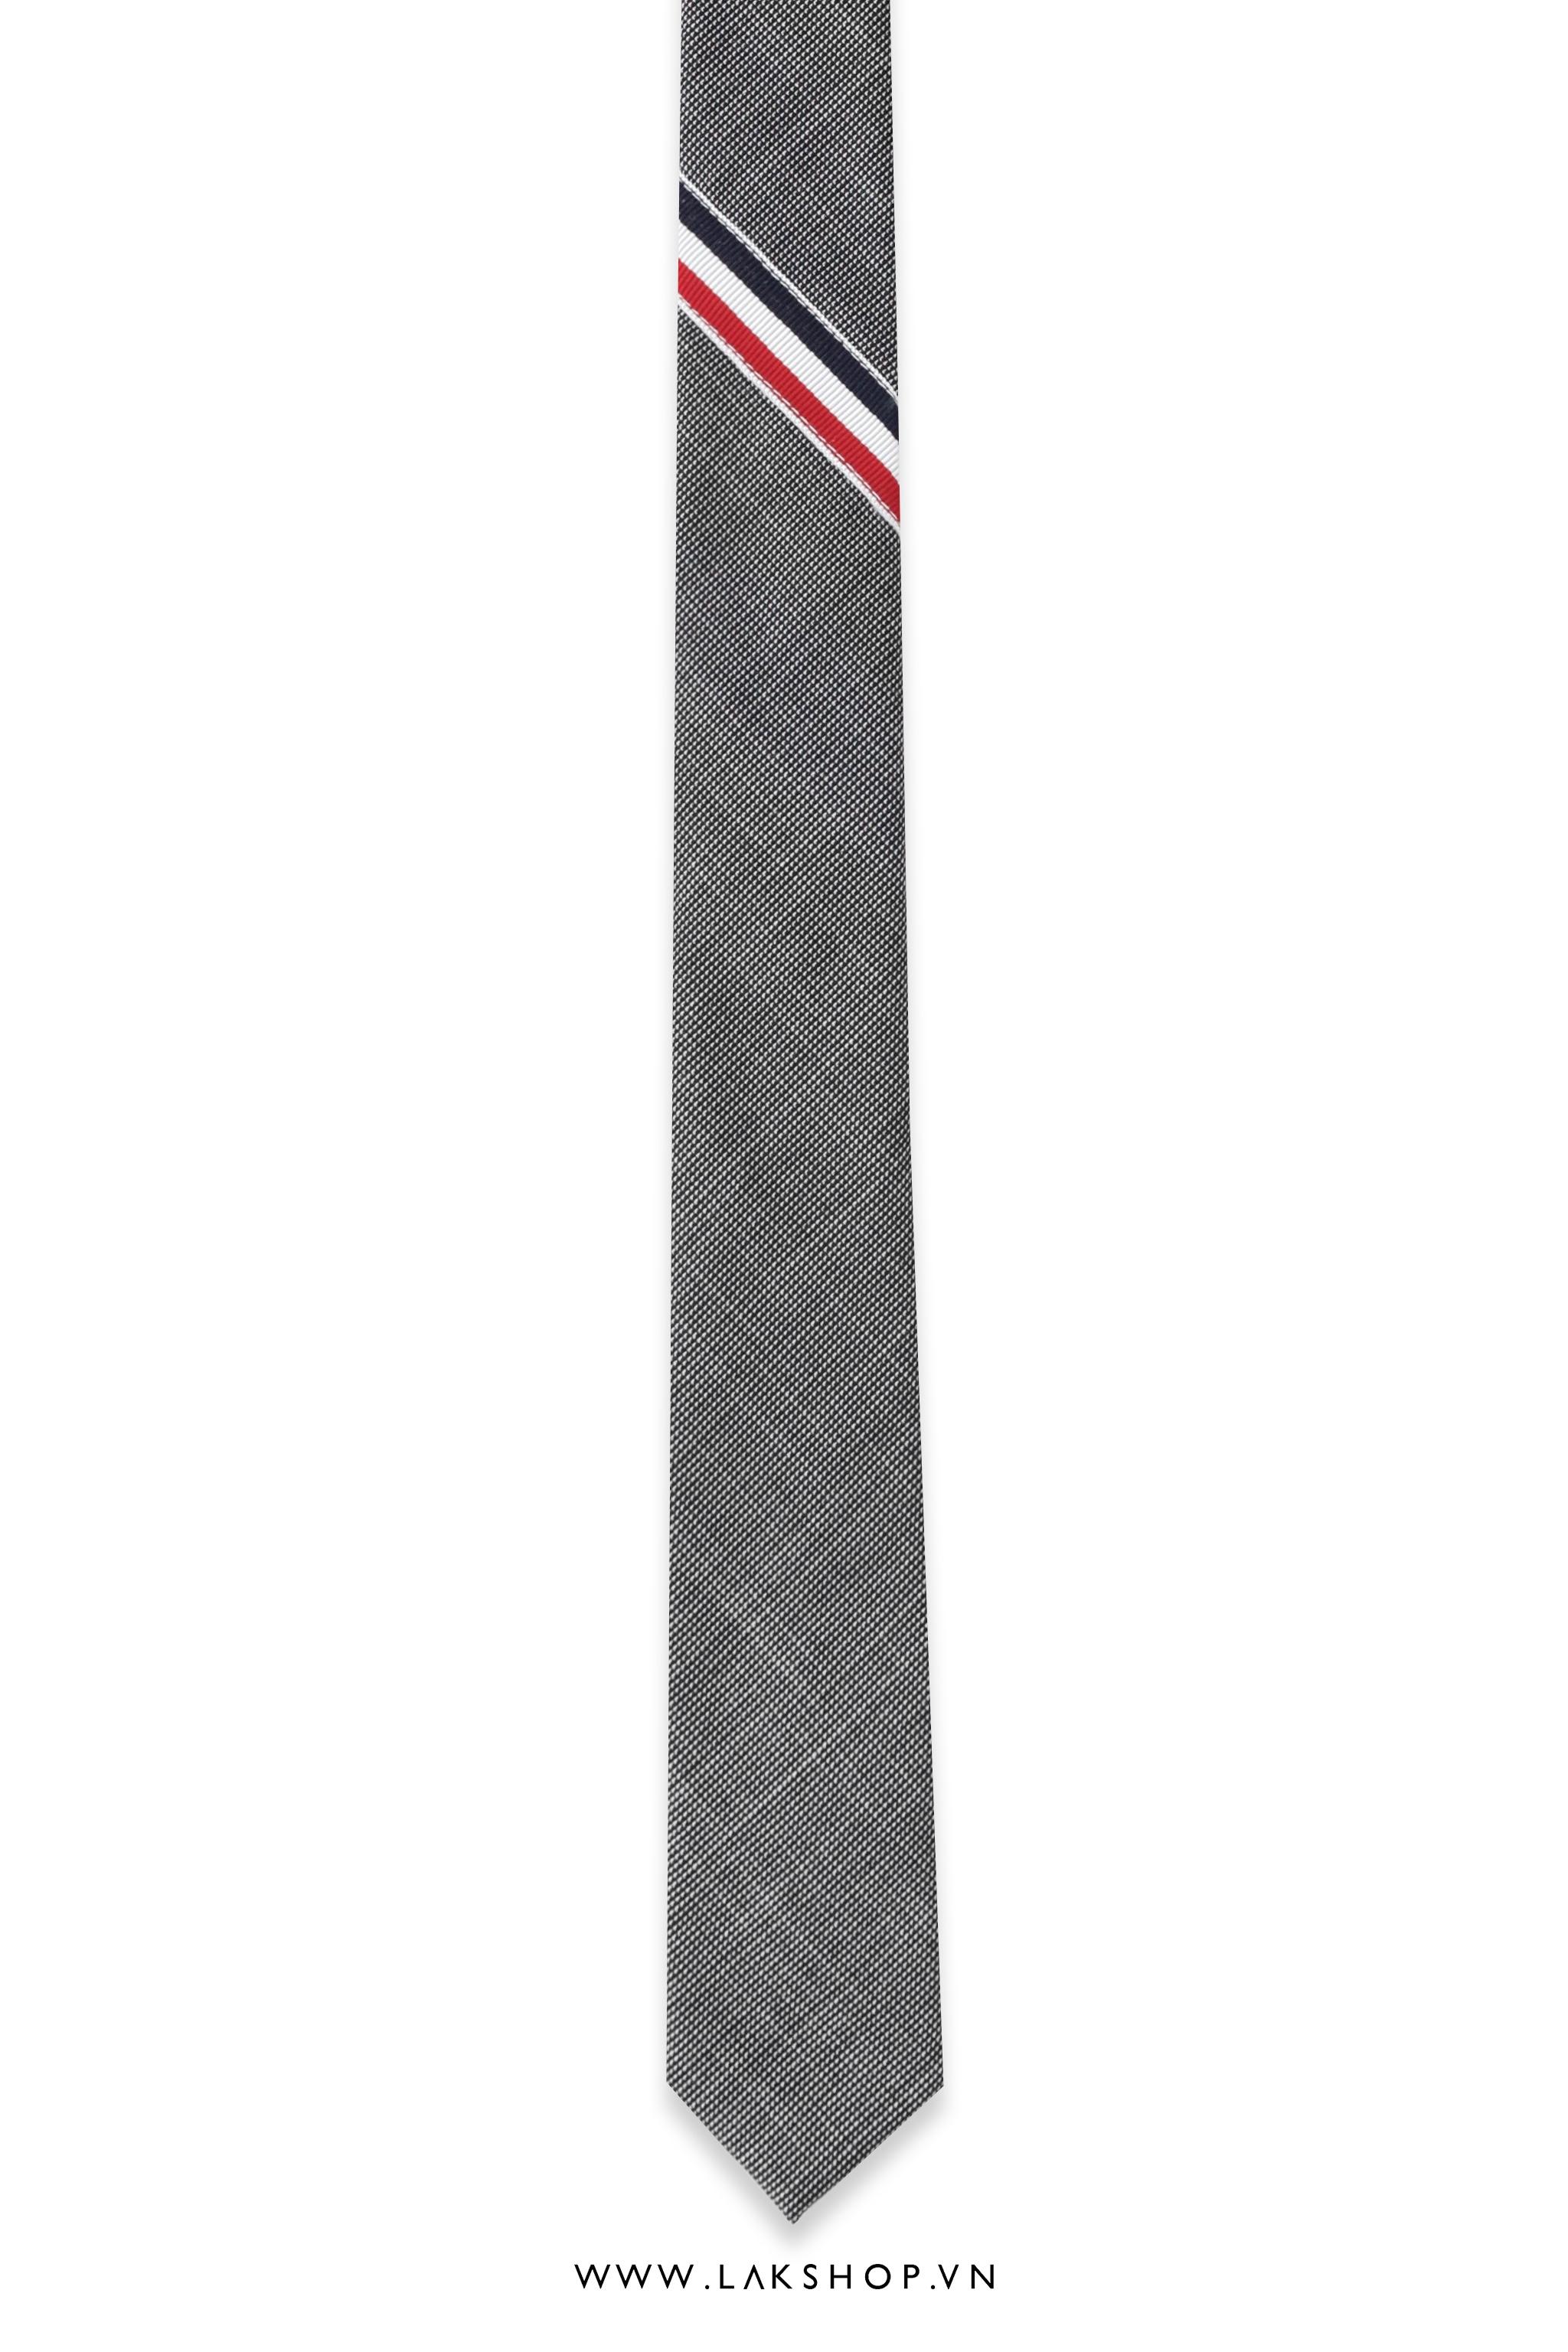 Thom Browne Classic Rwb Stripe Tie in Grey